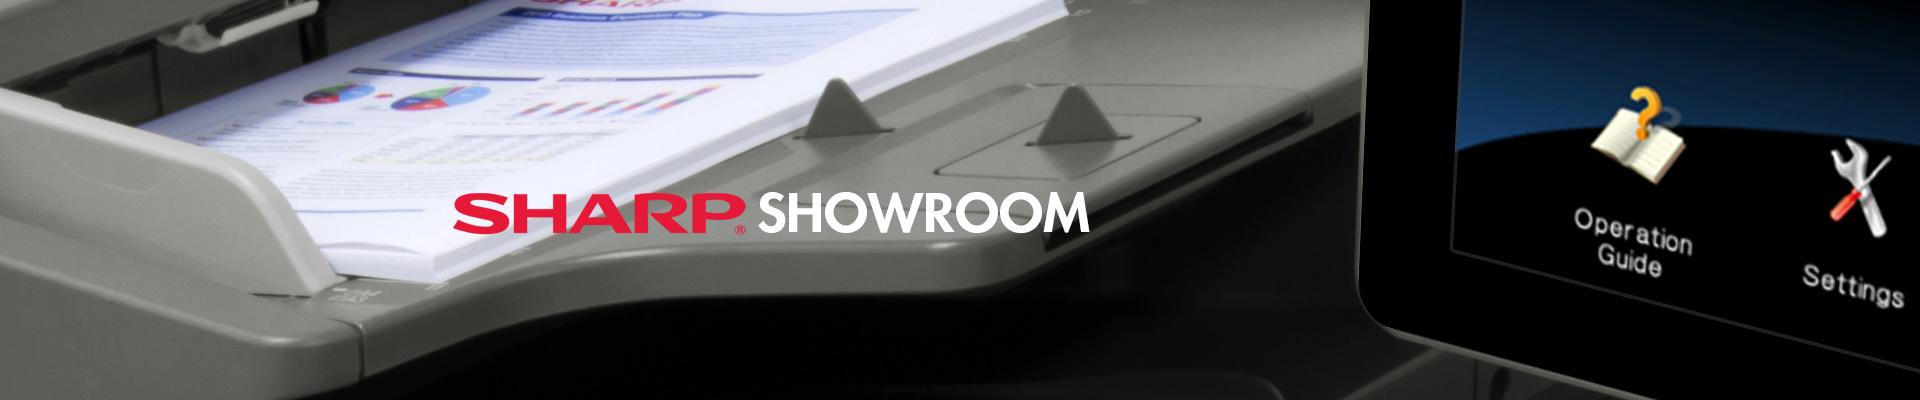 sharp-showroom-banner